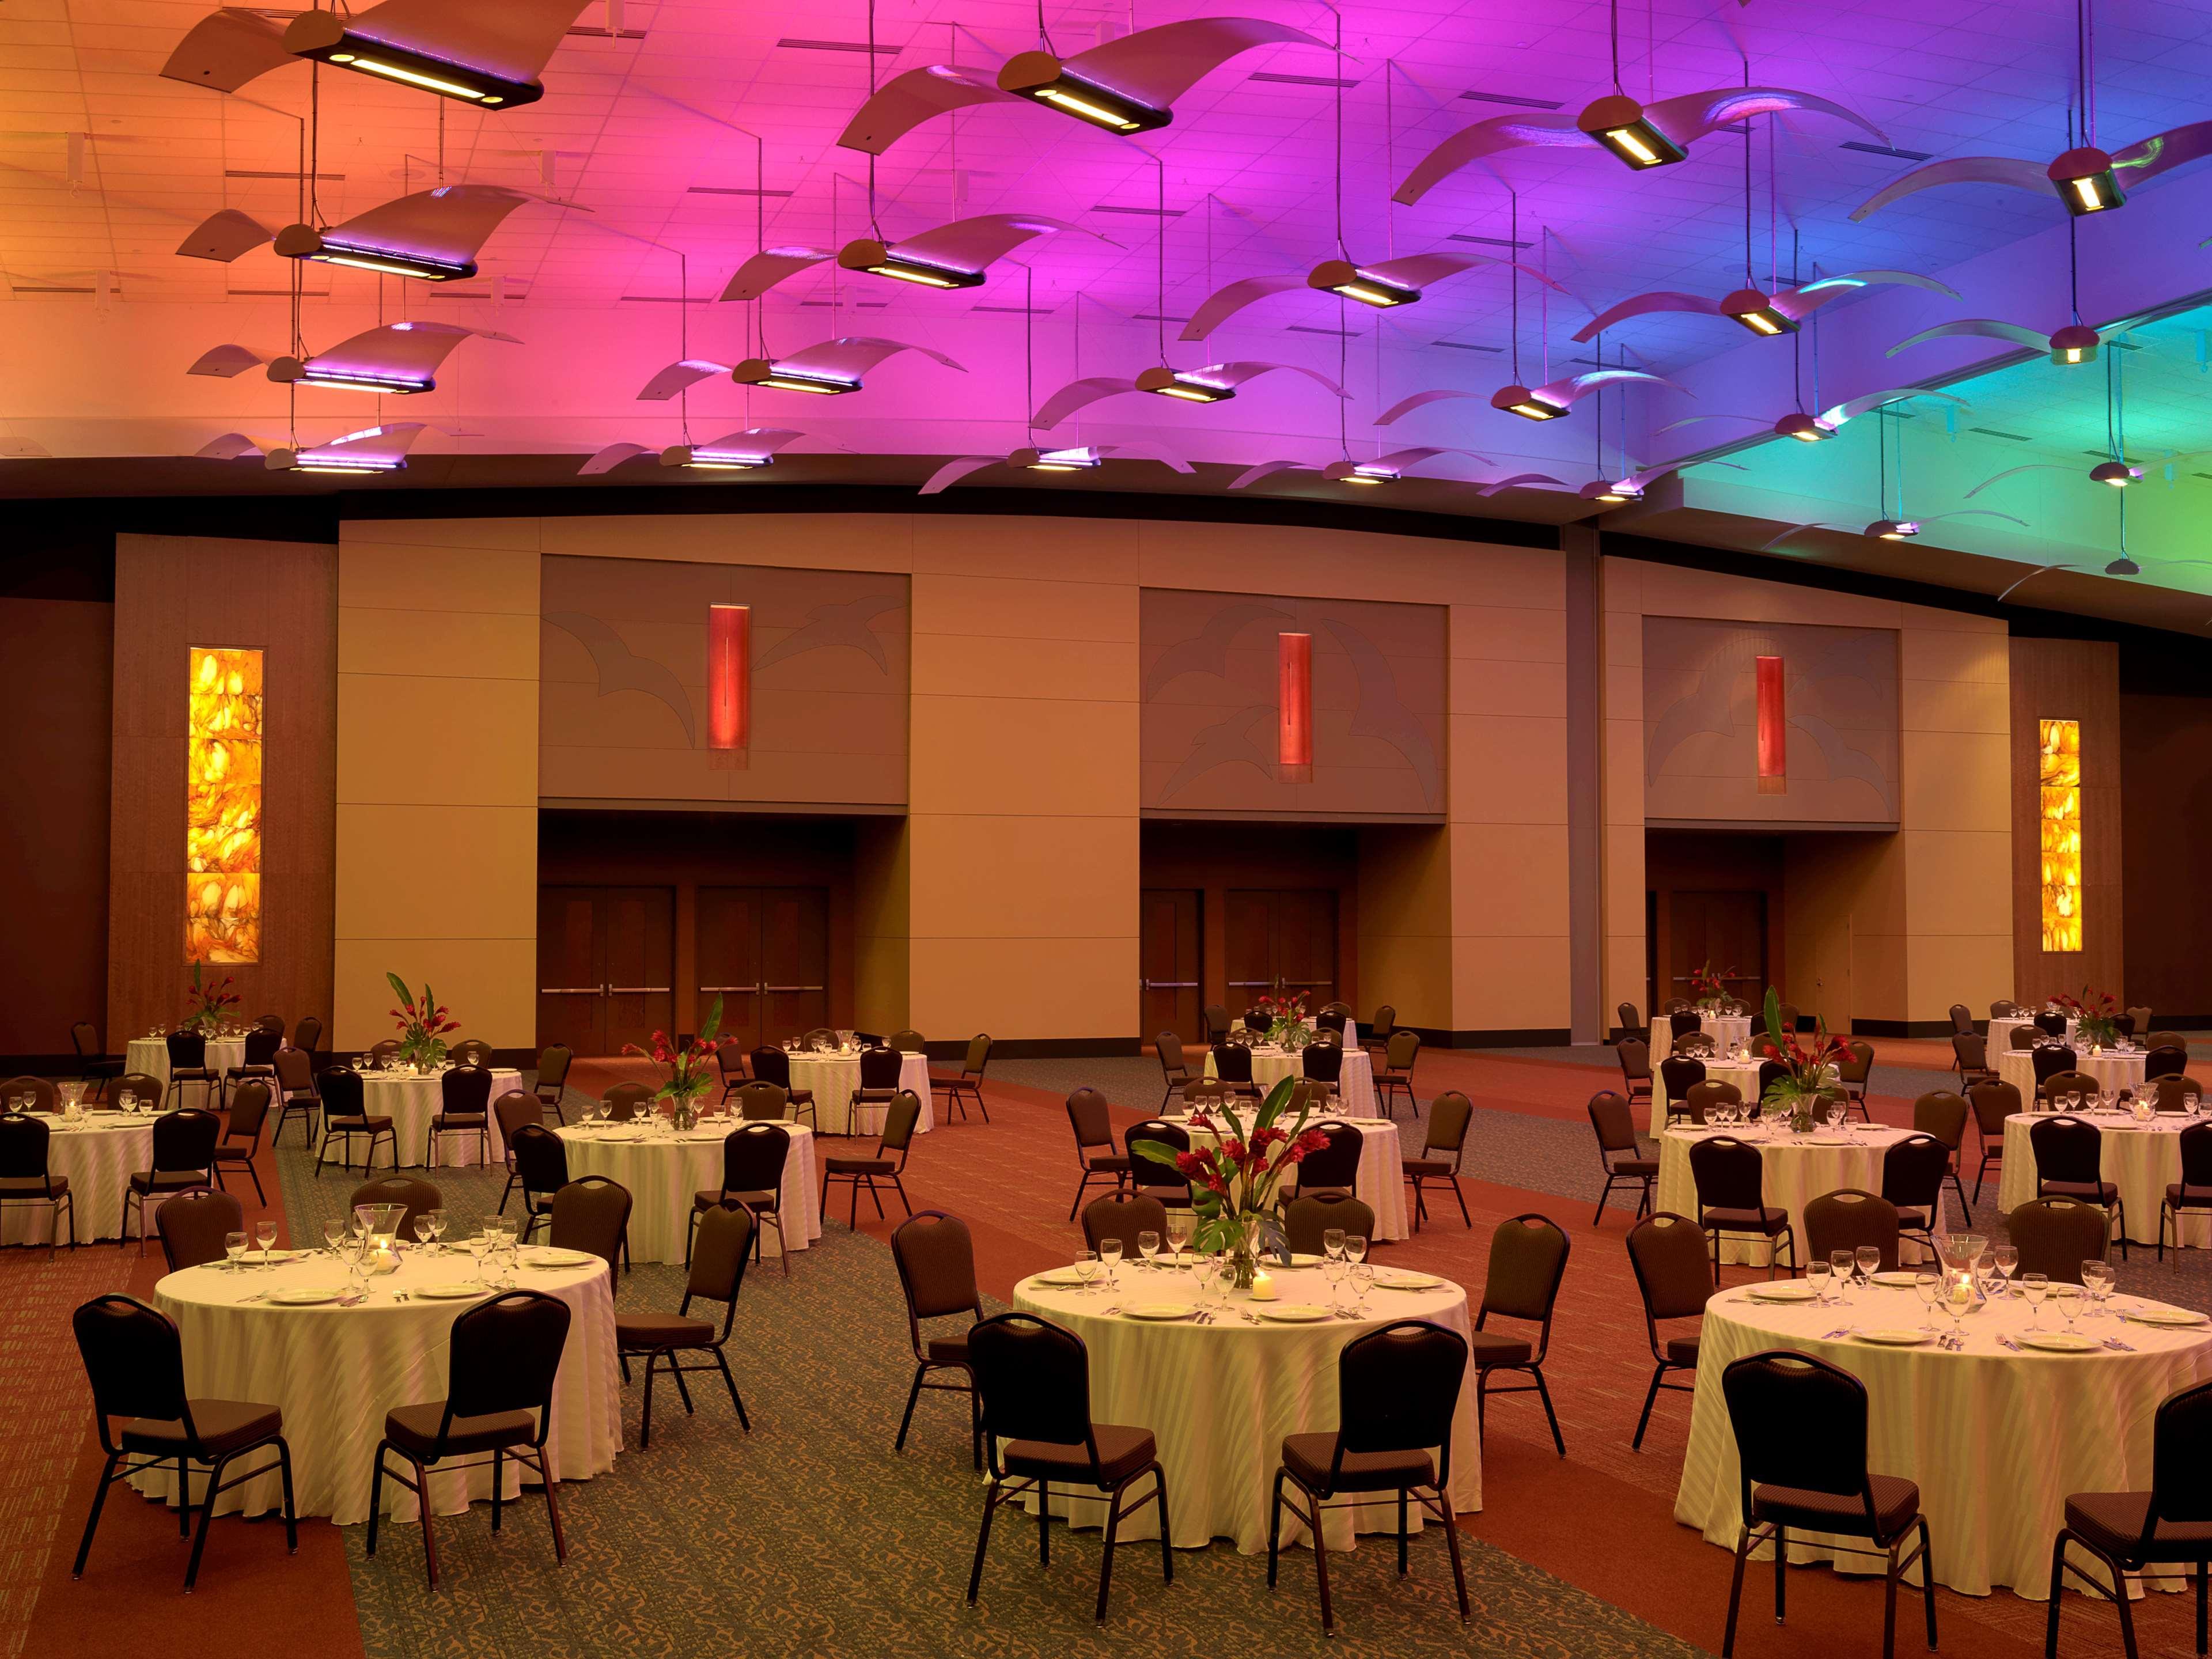 Hilton Branson Convention Center image 49